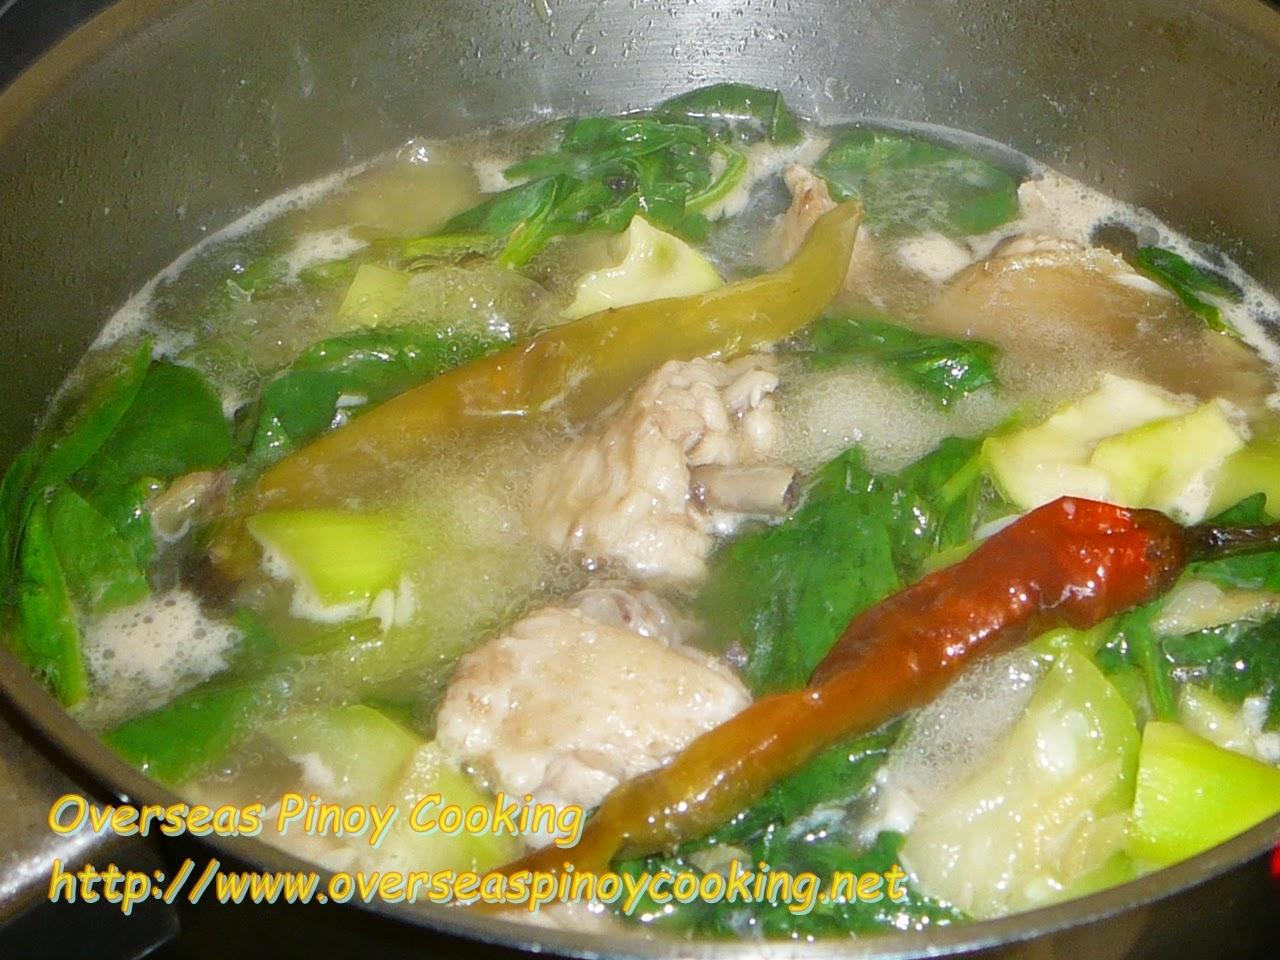 Tinolang Manok sa Upo - Cooking Procedure